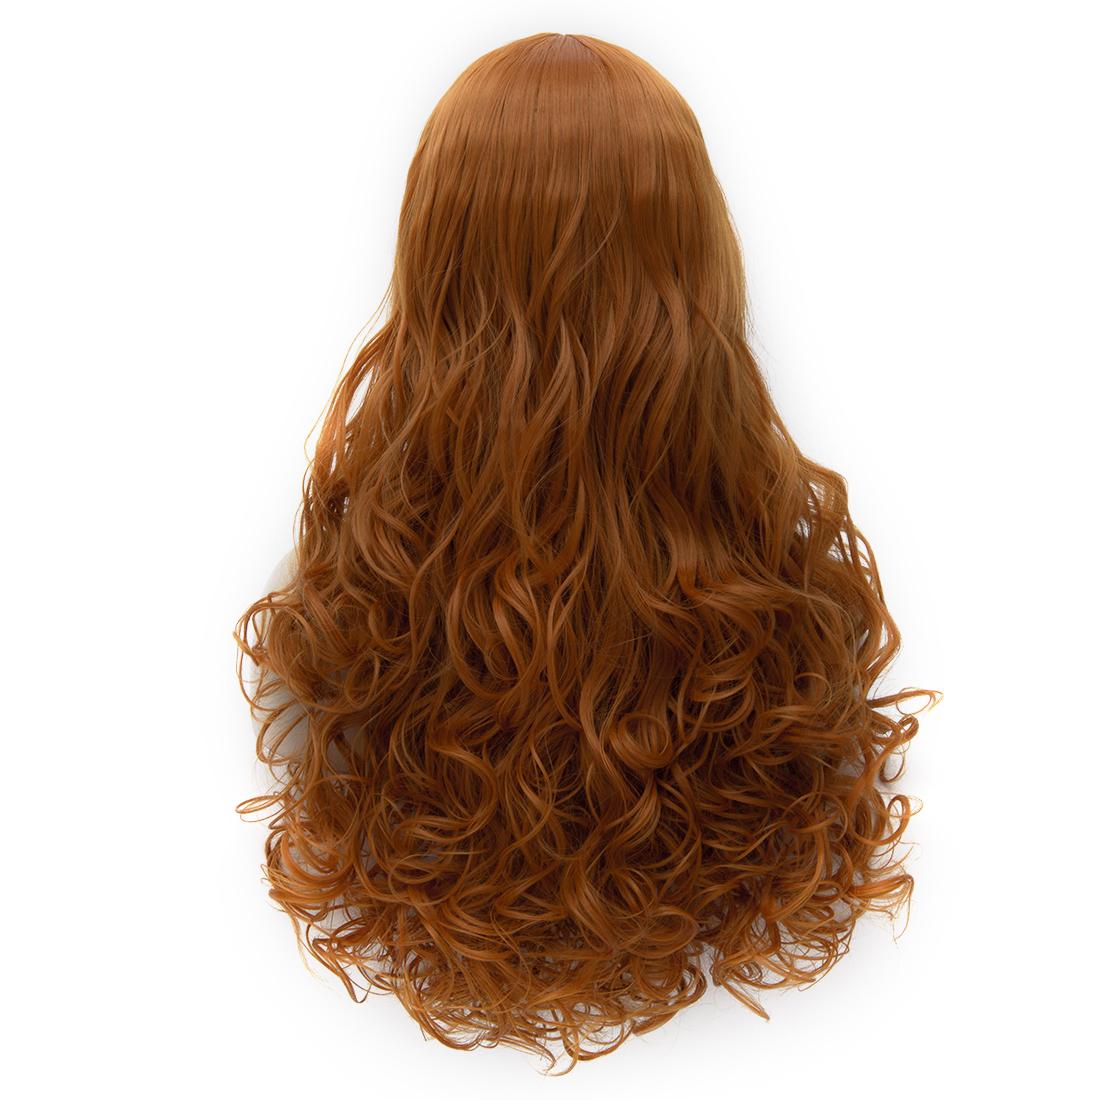 Online Wigs Long Curly Orange Golden Capless Wigs for Women